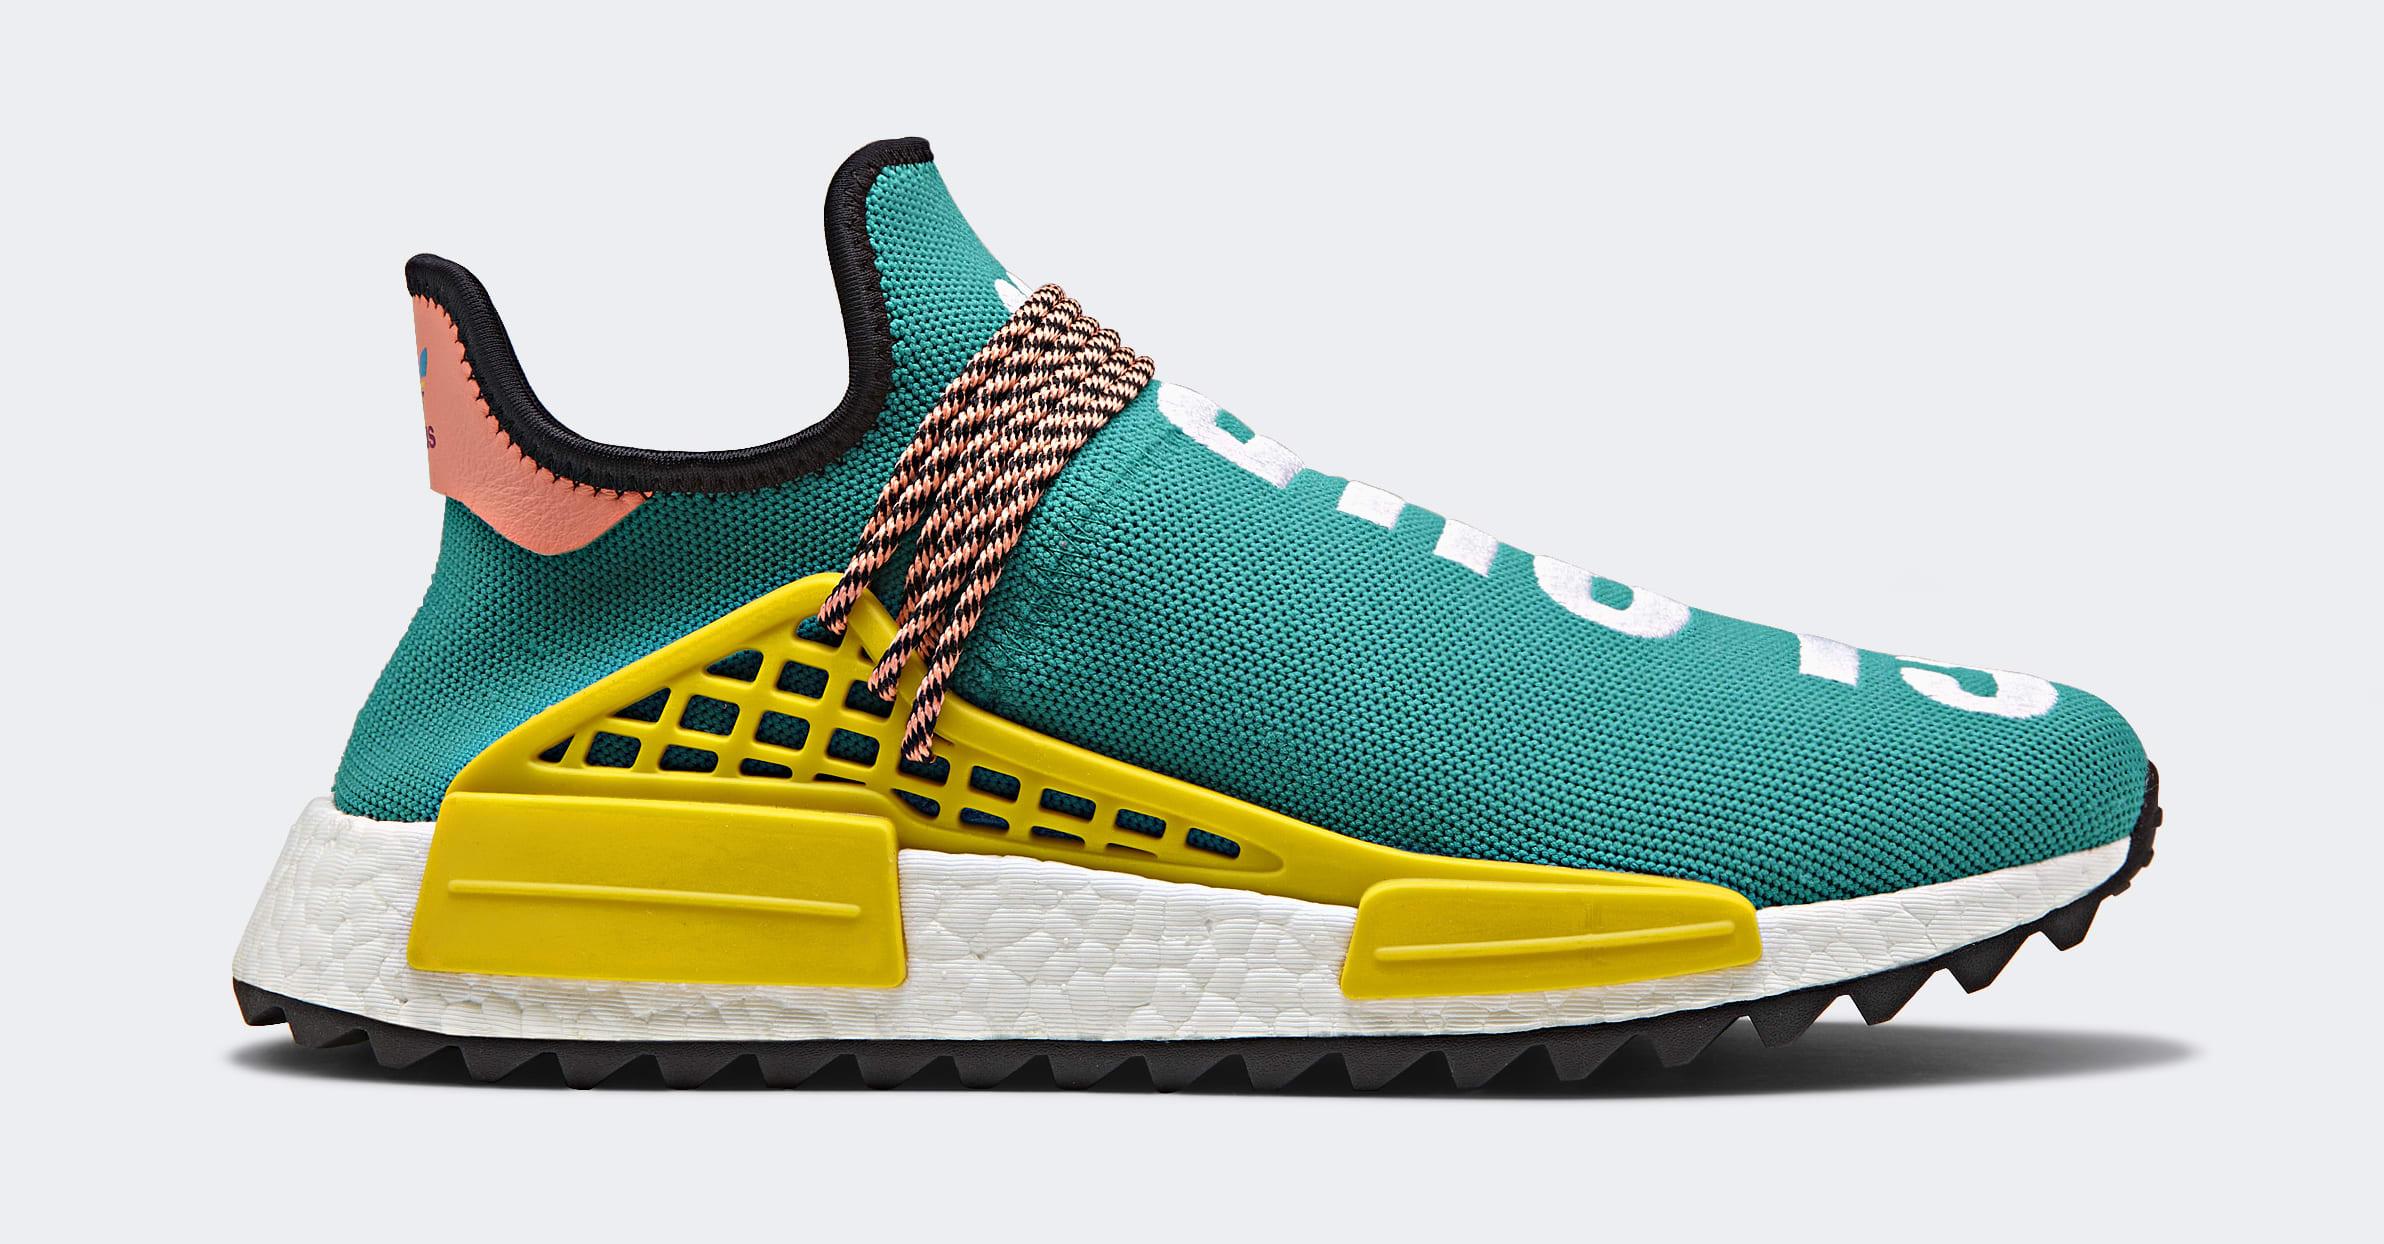 3188830b73079 World Famous adidas NMD Human Race Customs